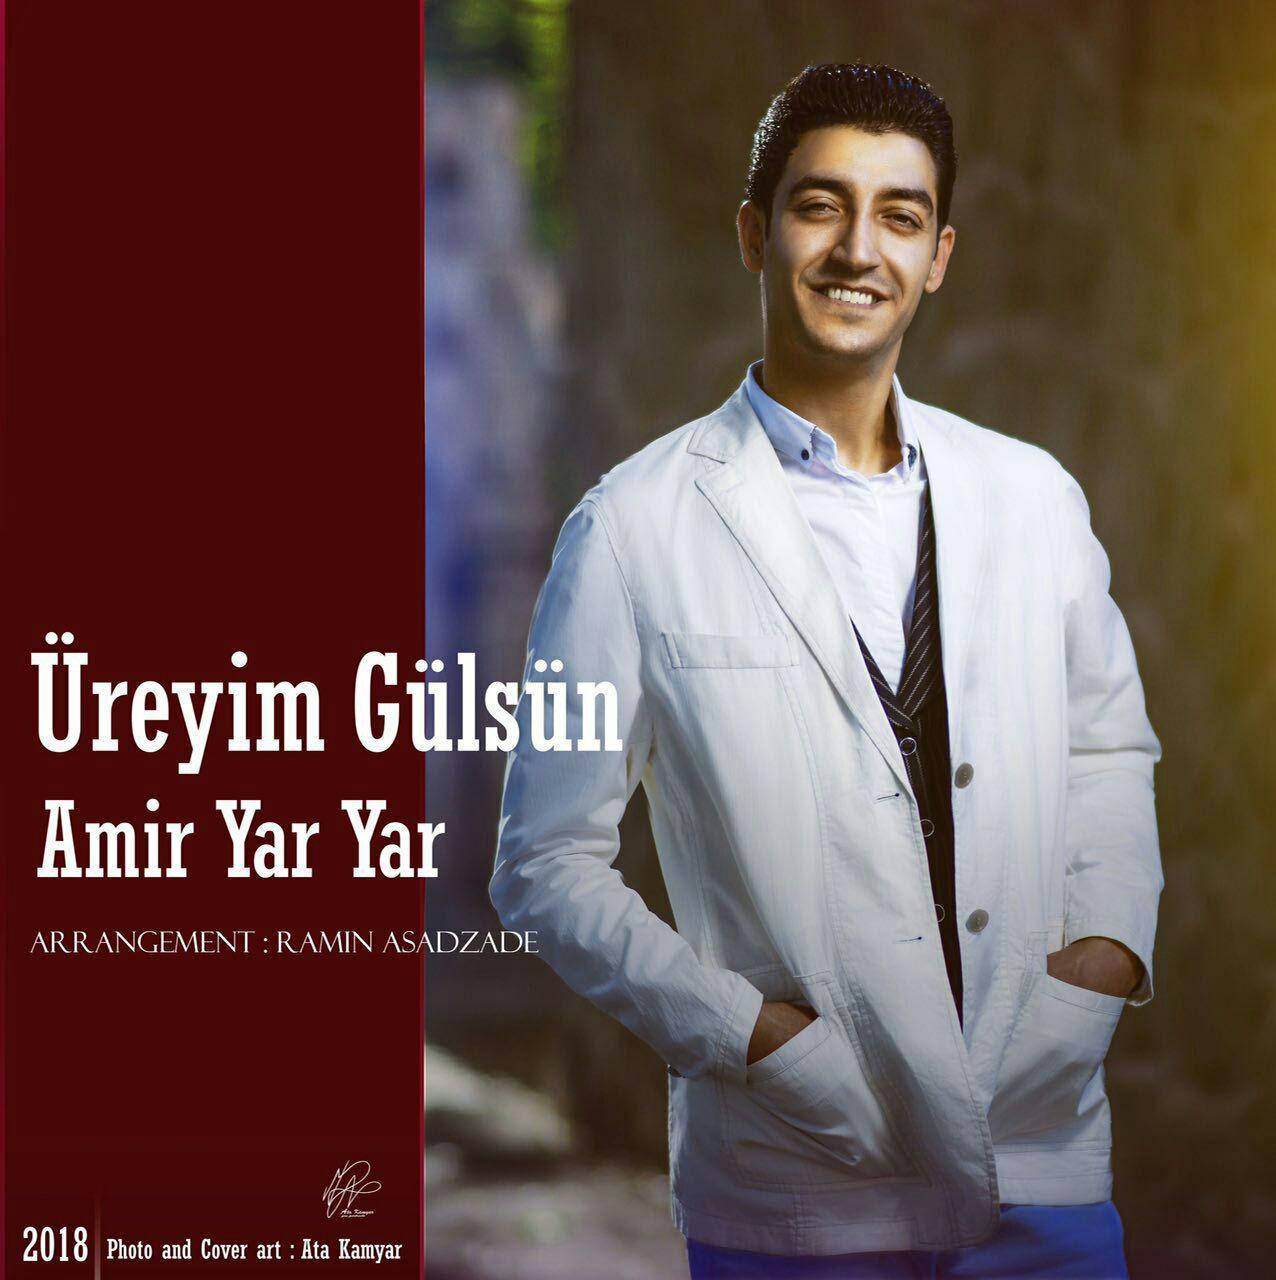 http://s9.picofile.com/file/8359026626/06Amir_Yar_Yar_Ureyim_Gulsun.jpg